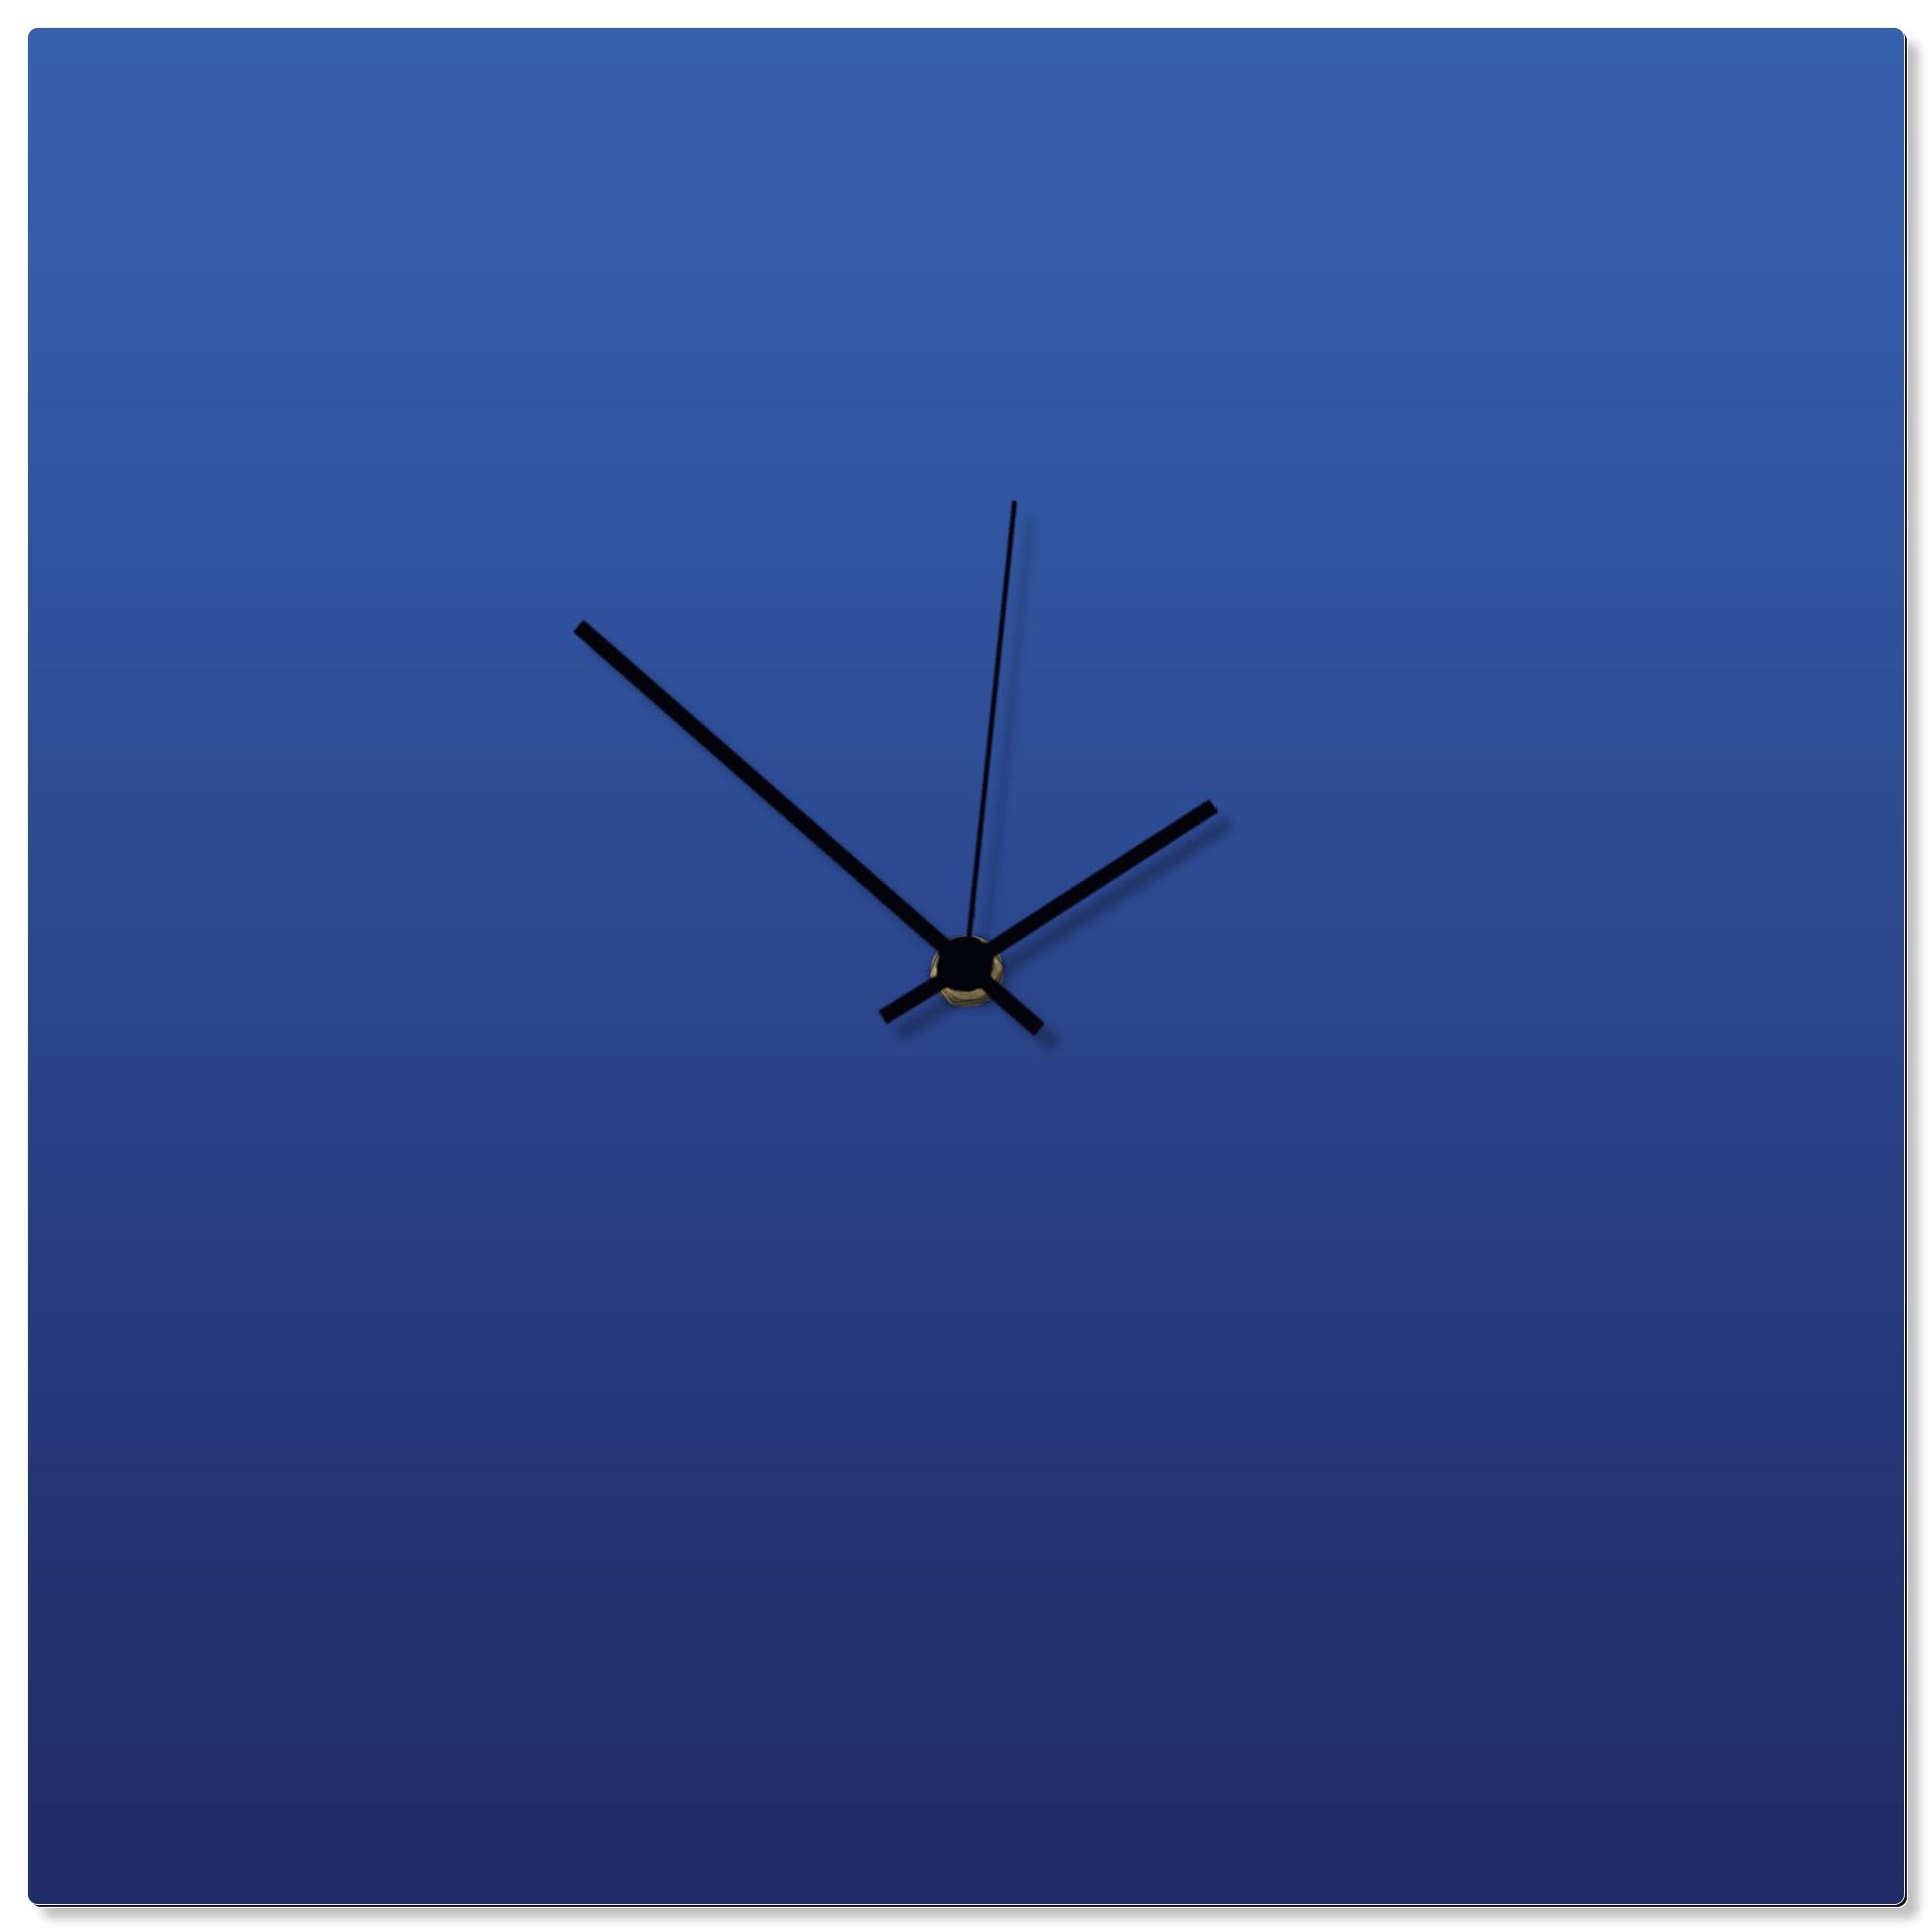 Blueout Black Square Clock 16x16in. Aluminum Polymetal